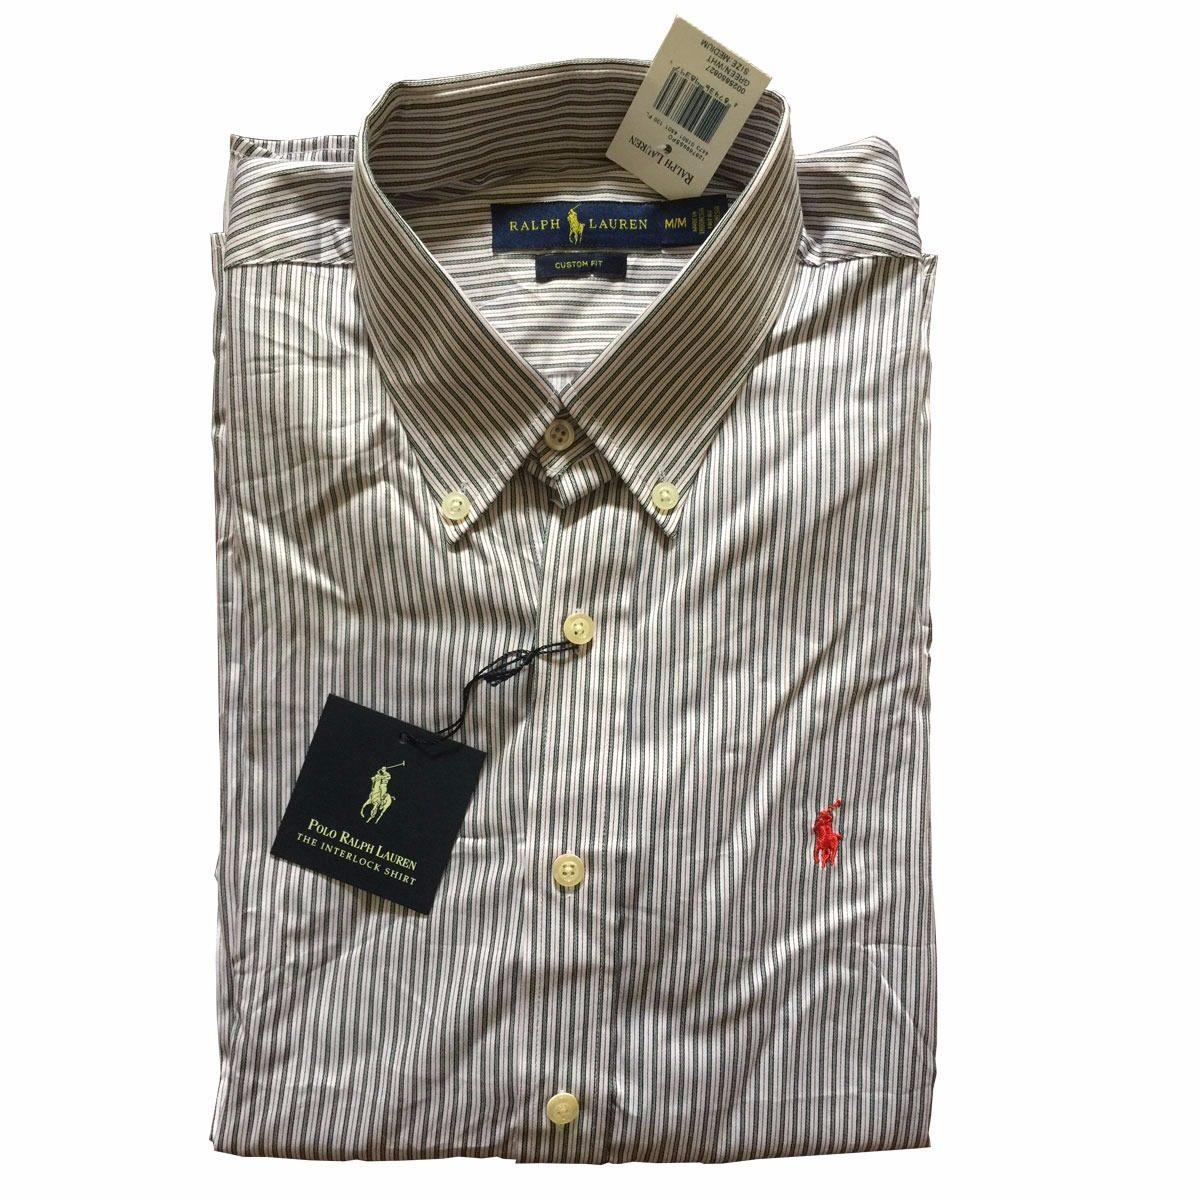 camisa social ralph lauren masculina original - tam  m - p1. Carregando zoom . 4a28756d6bf